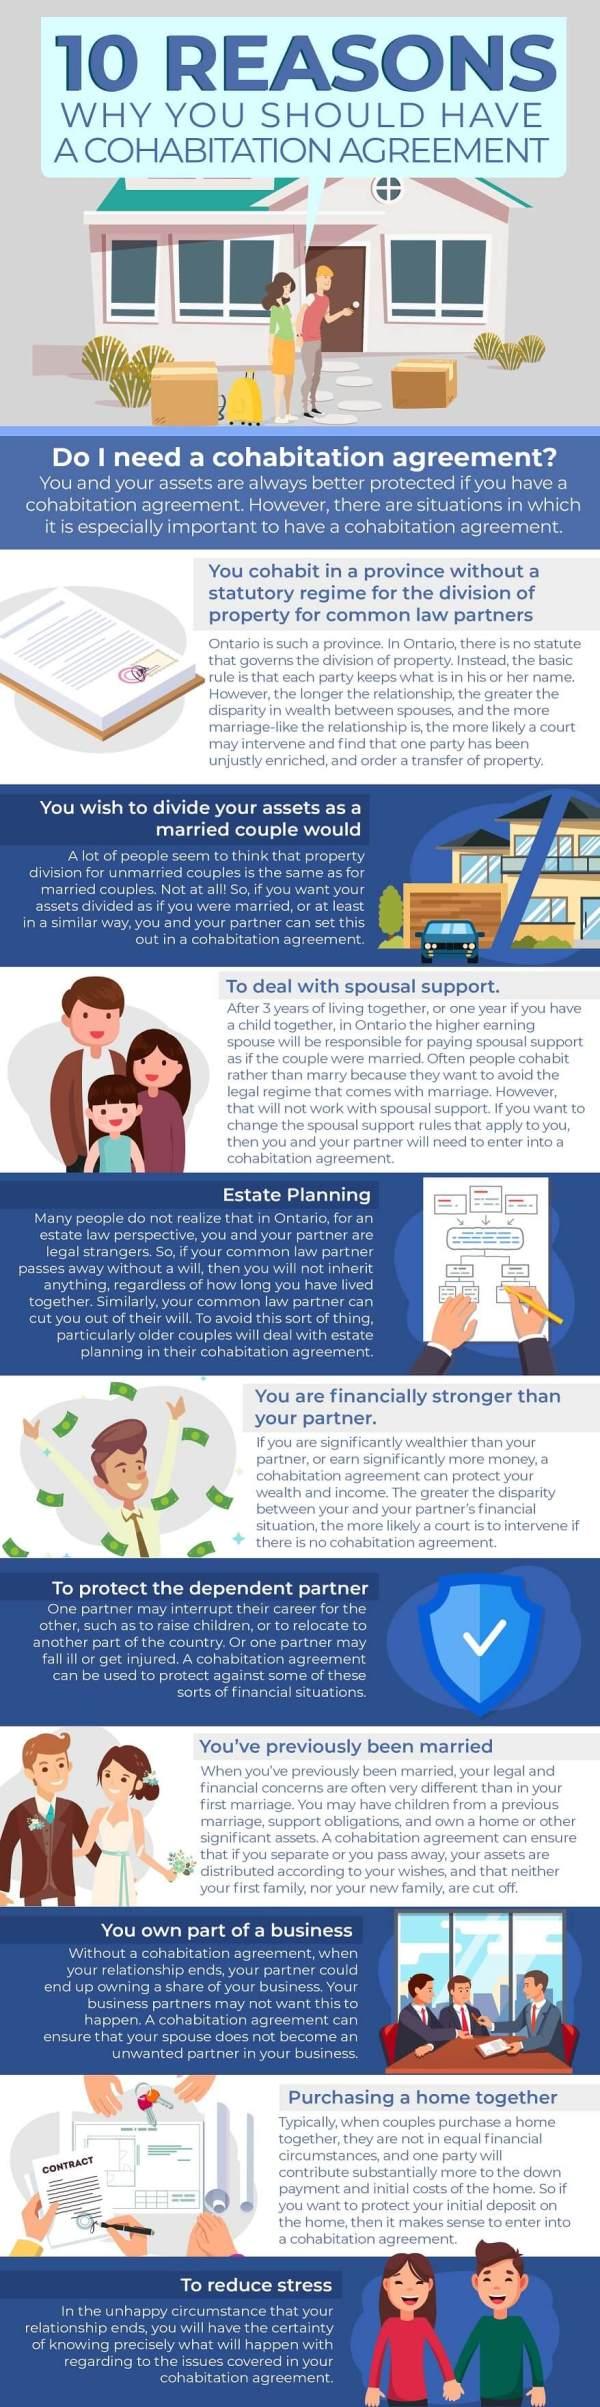 Cohabitation-Infographic